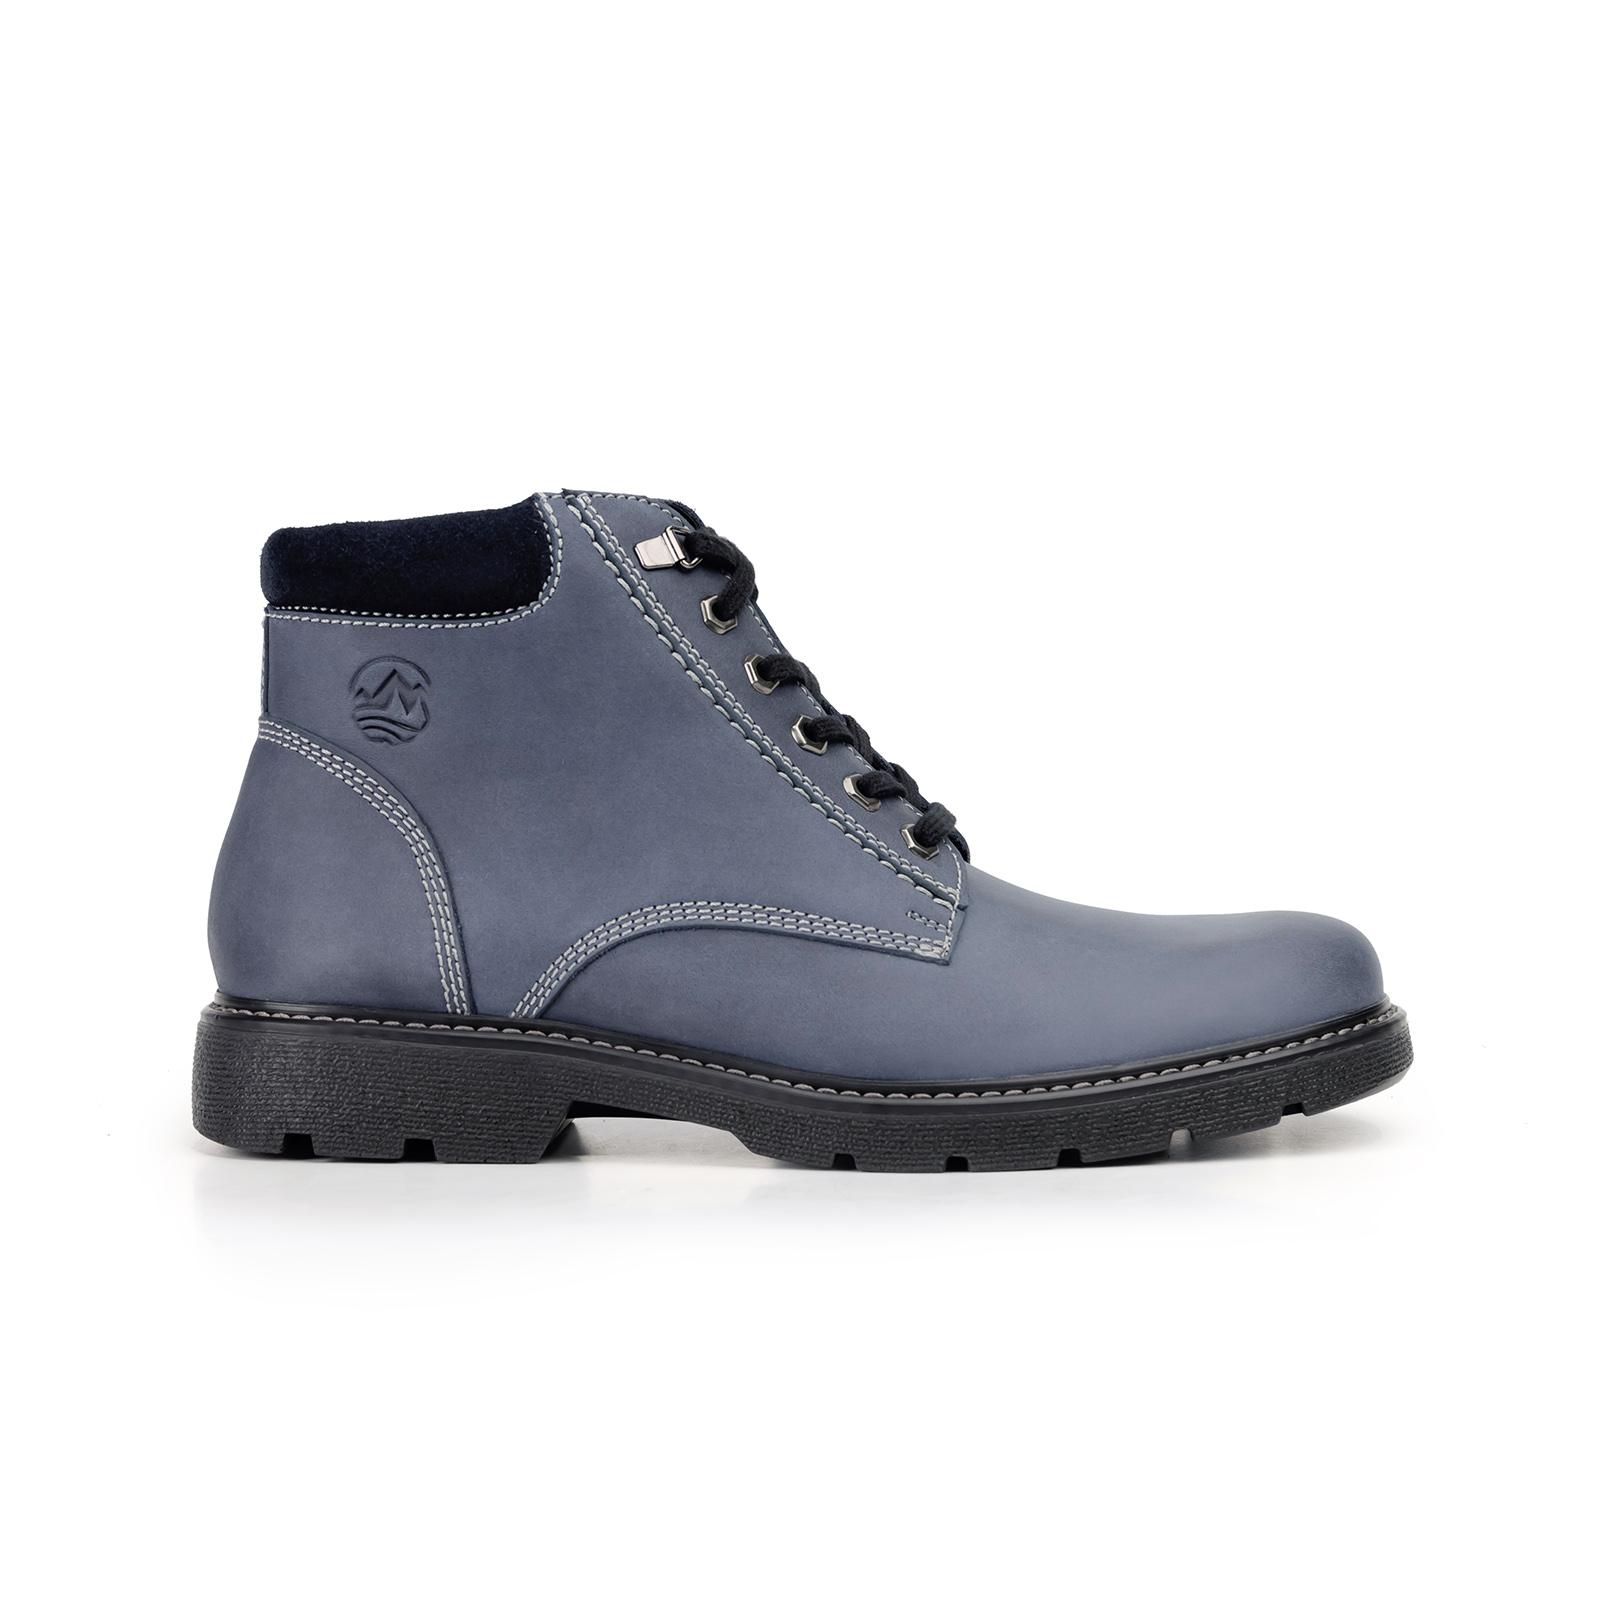 61c8464353160b Ted Baker Women 100 Authentic Tinzel Embellished Slip On 668 Flat Shoes  Black Source · BAKER 94601 BLUE Flexi United States